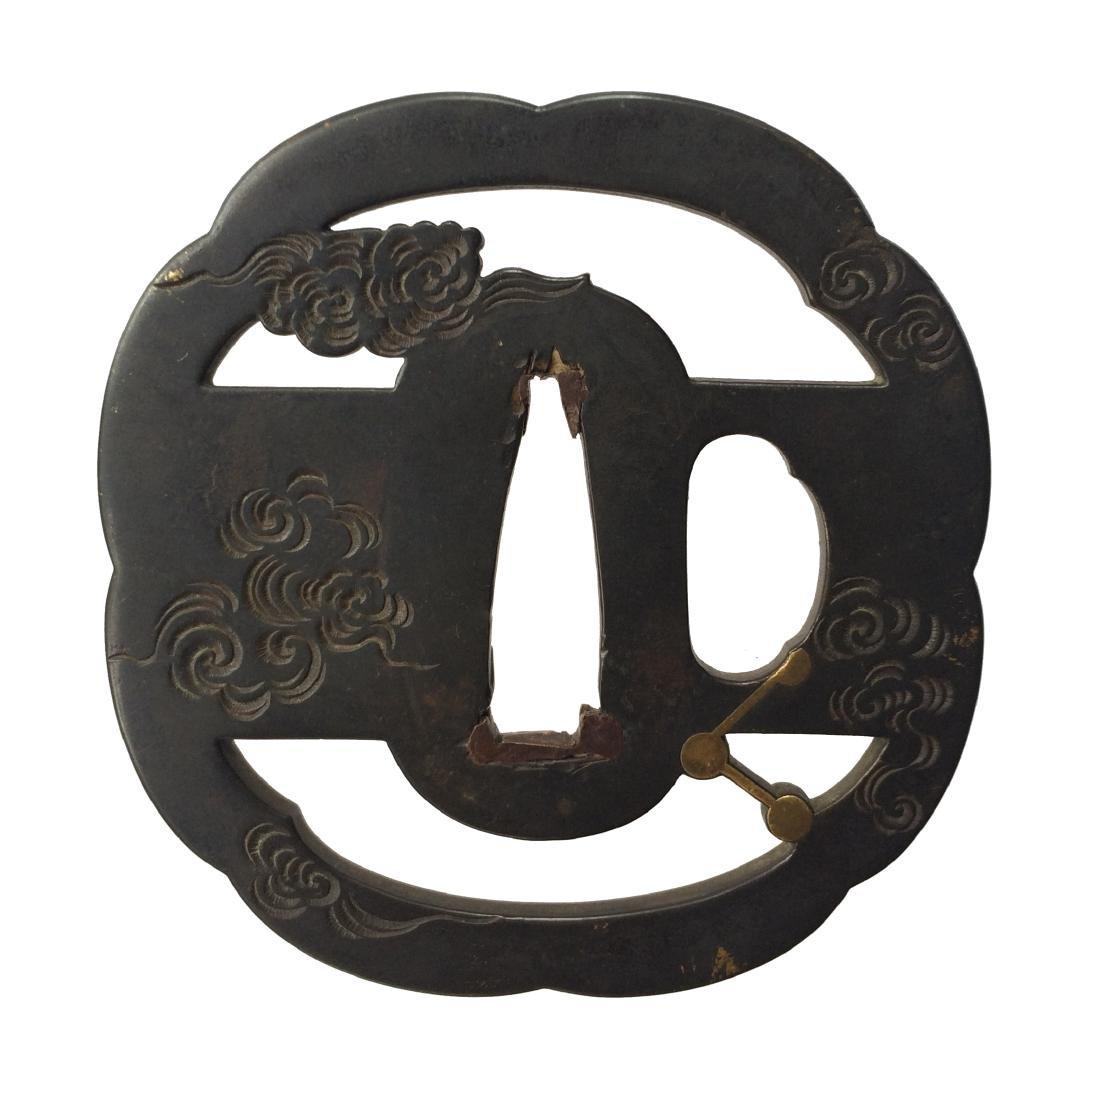 Signed kinko tsuba with celestial motif by Umetada